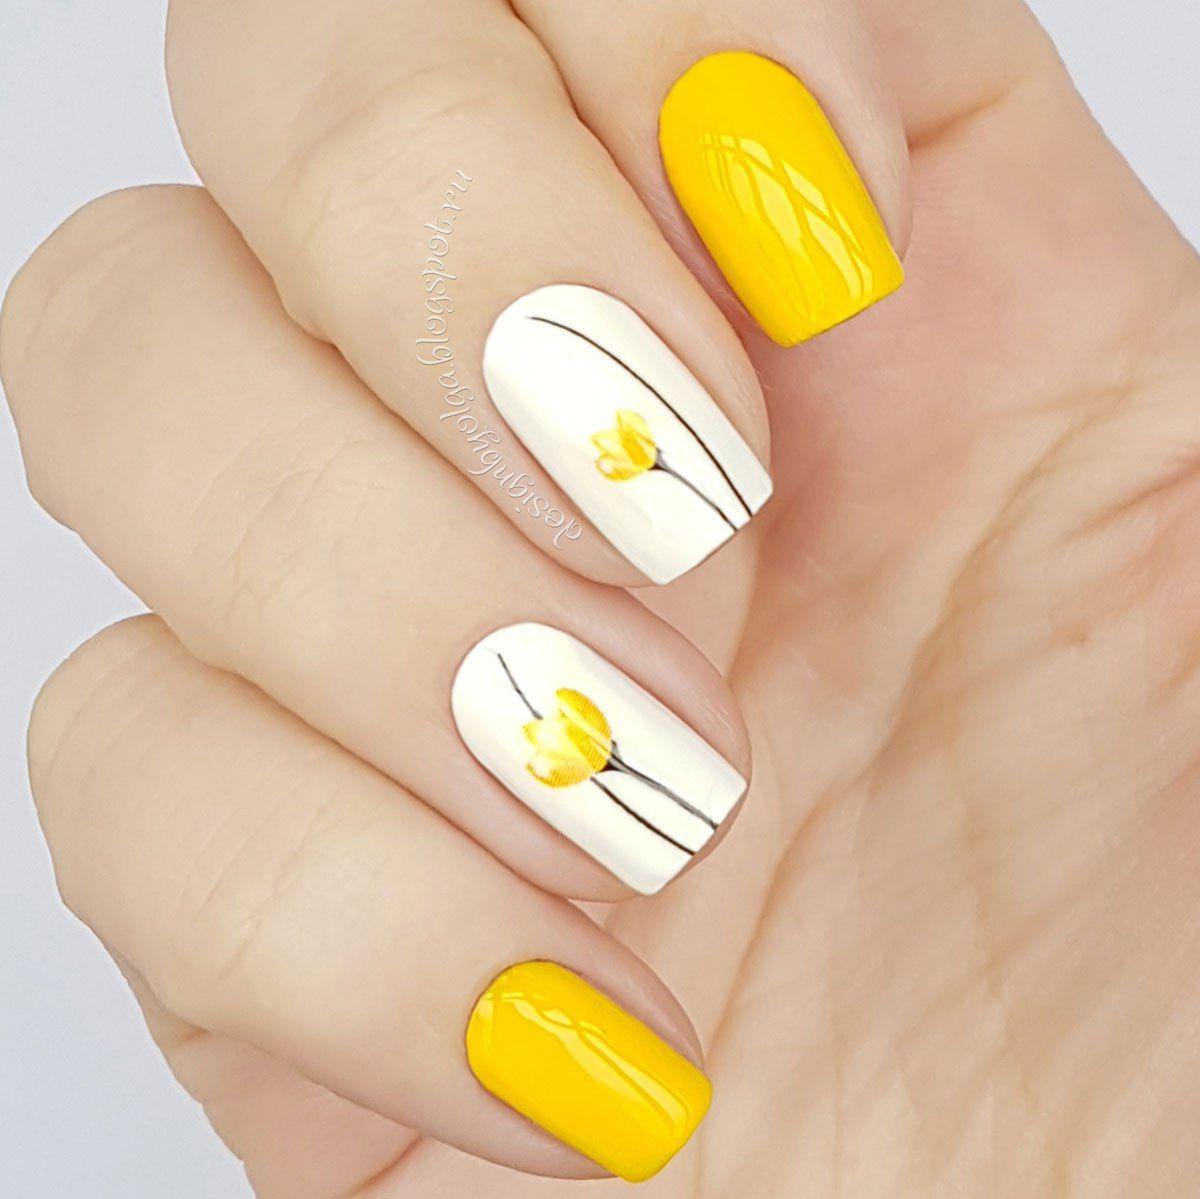 bpwomen.ru Our email (for orders) info@bpwomen.ru Instagram @slider_bpwomen water decals, sliders, slider, bpwstyle, nail decals, nail stickers, nail wraps, foil nails, bpwomen, BPW, flash nails, minx, nail stencil, decal stickers https://noahxnw.tumblr.com/post/160769128431/decorate-heart-shaped-cookies-for-the-loved-ones